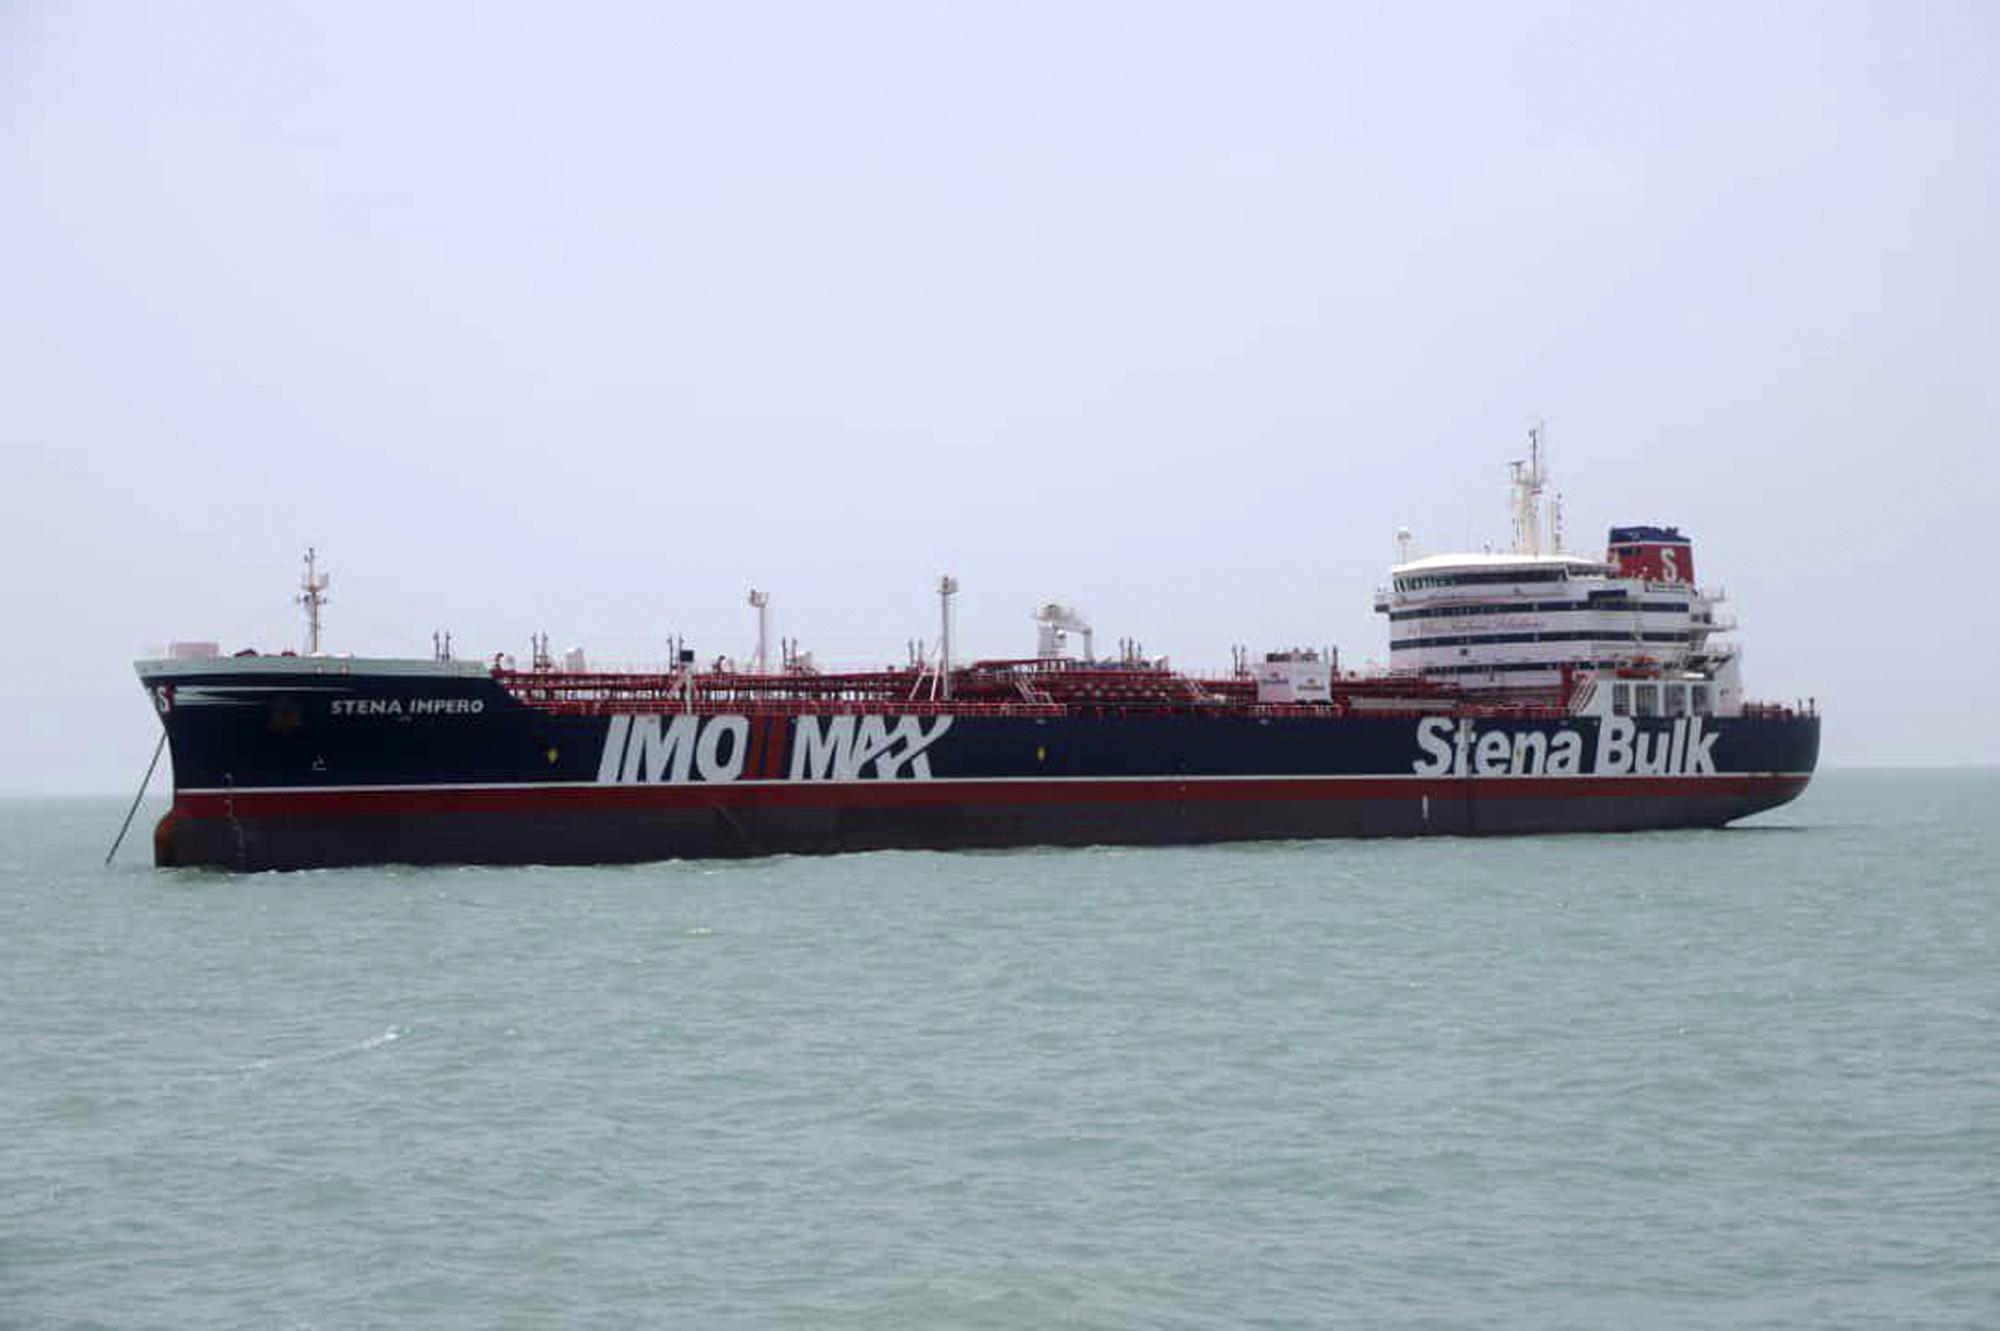 UK navy heard in audio trying to thwart Iran ship seizure